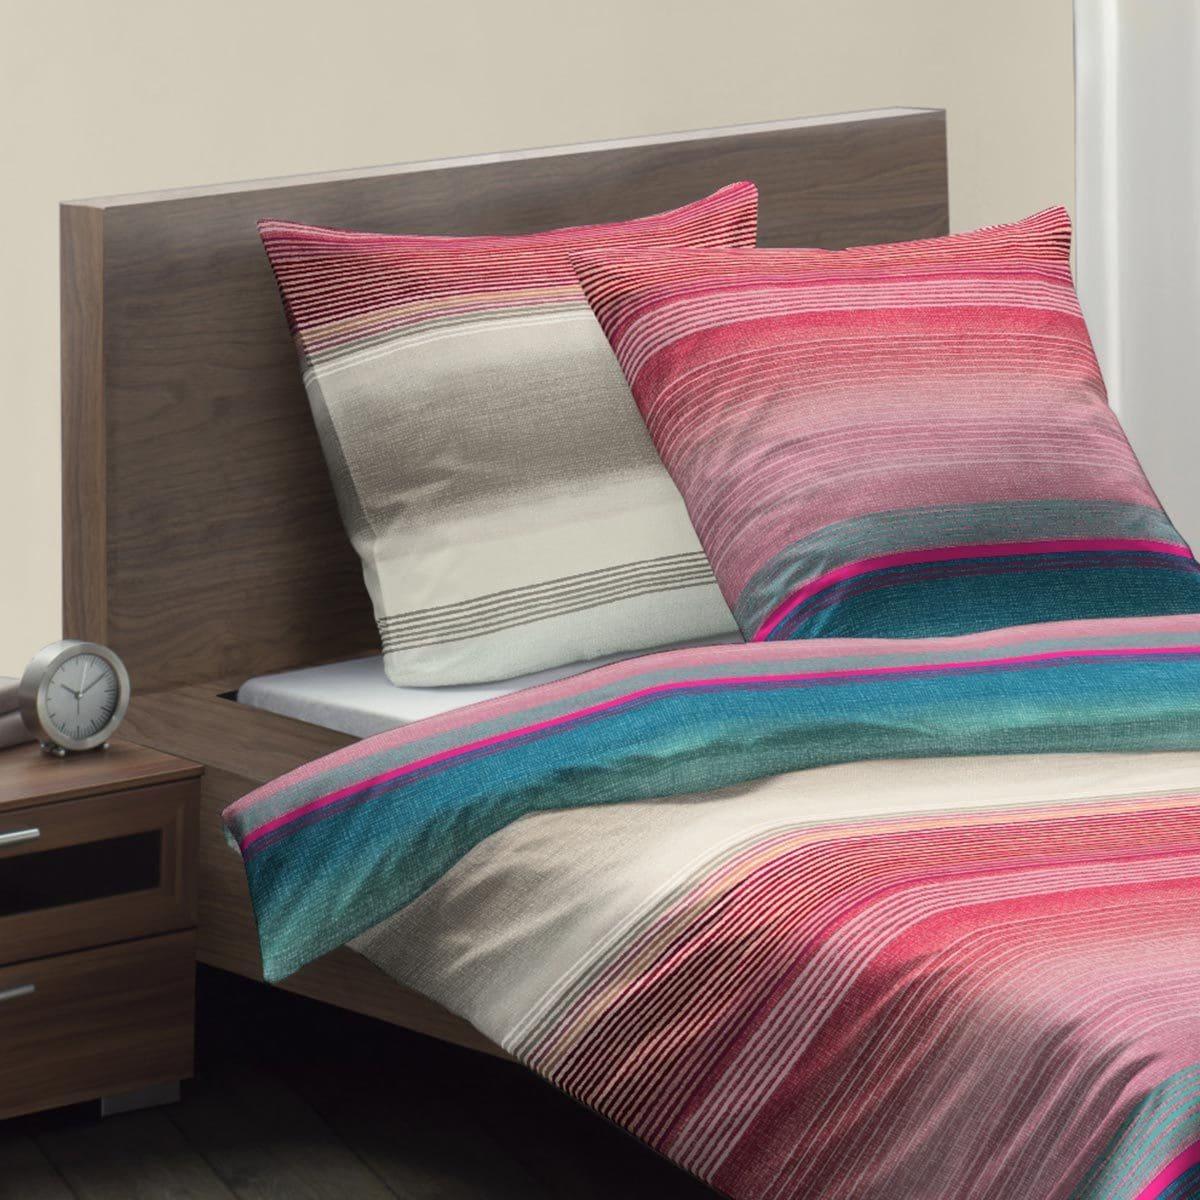 fleuresse mako satin bettw sche modern life 113511 0006. Black Bedroom Furniture Sets. Home Design Ideas